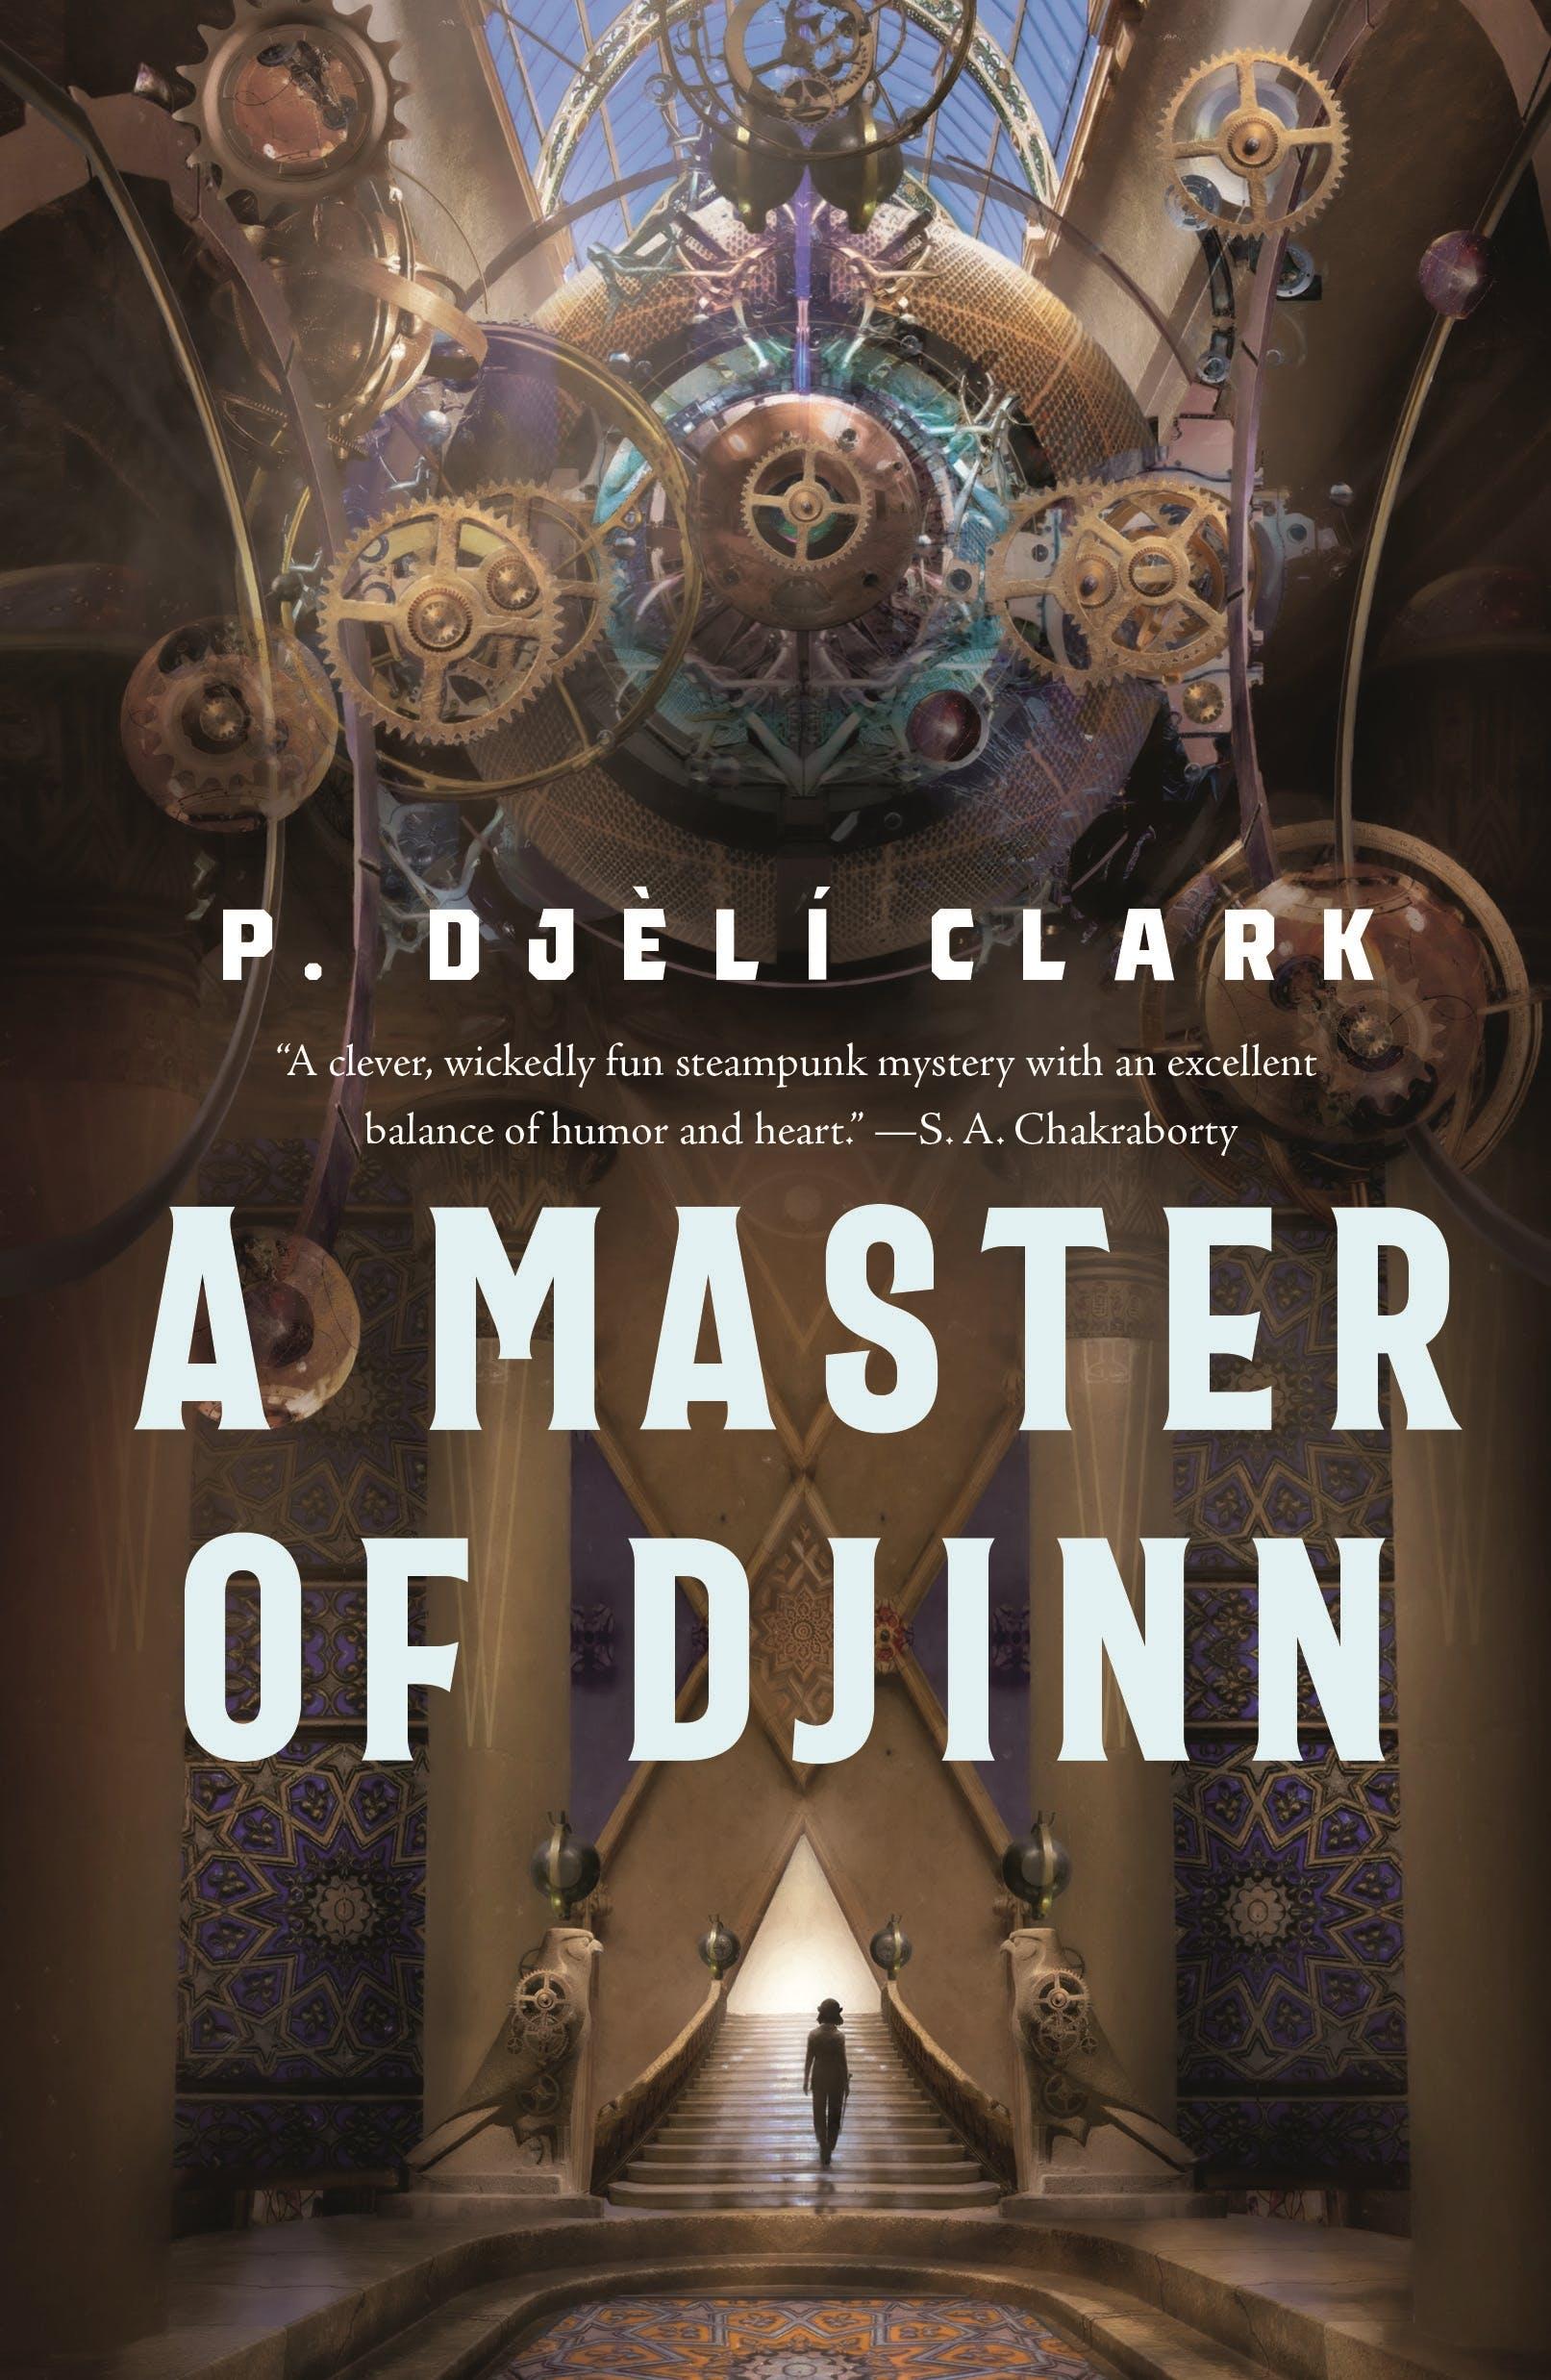 Image of A Master of Djinn